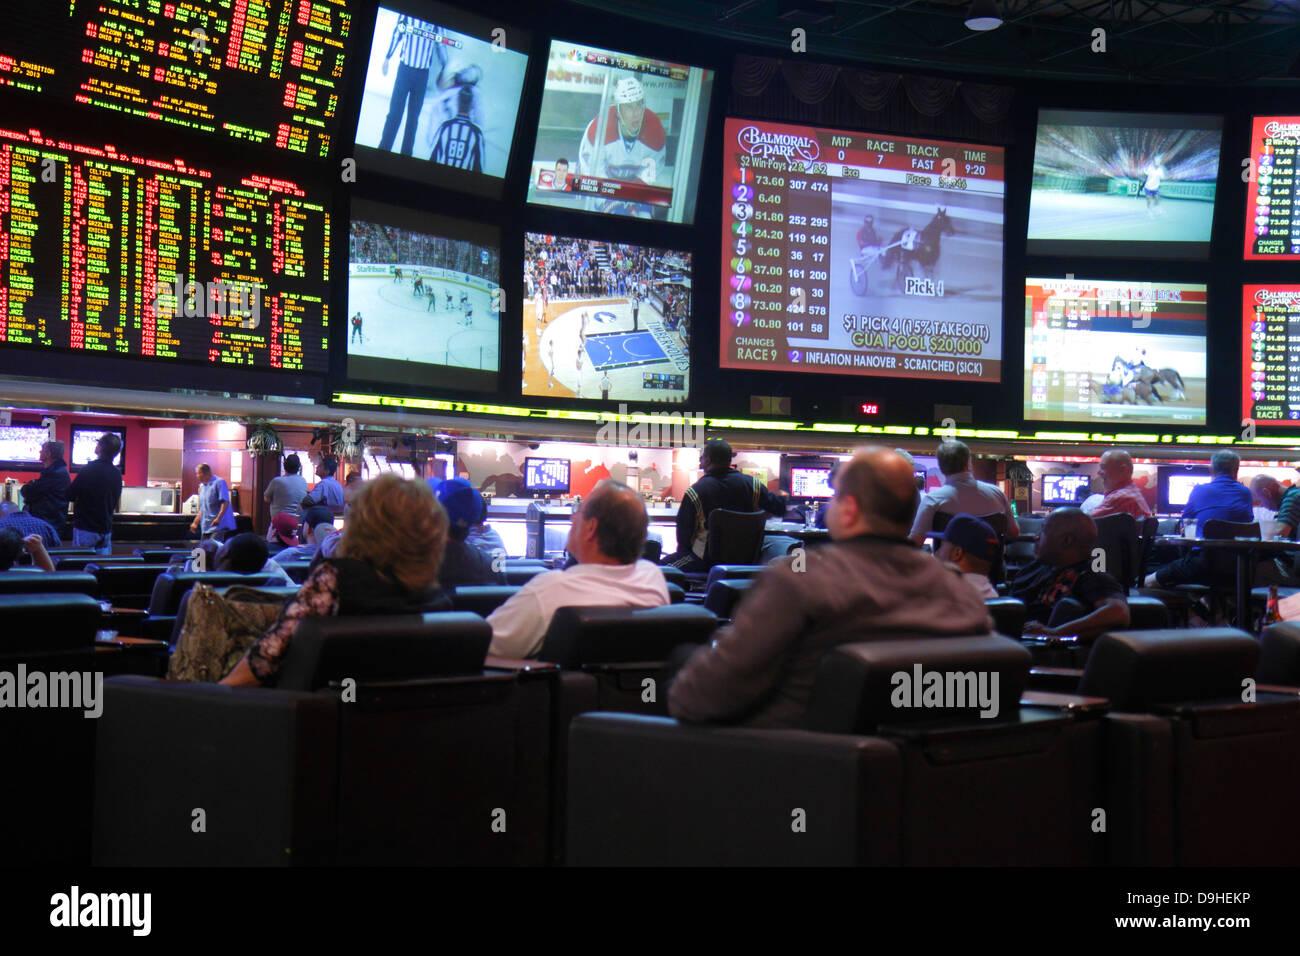 Nevada Las Vegas Las Vegas Hotel & Casino LVH race sports book betting odds gamblers gambling monitors big screens - Stock Image